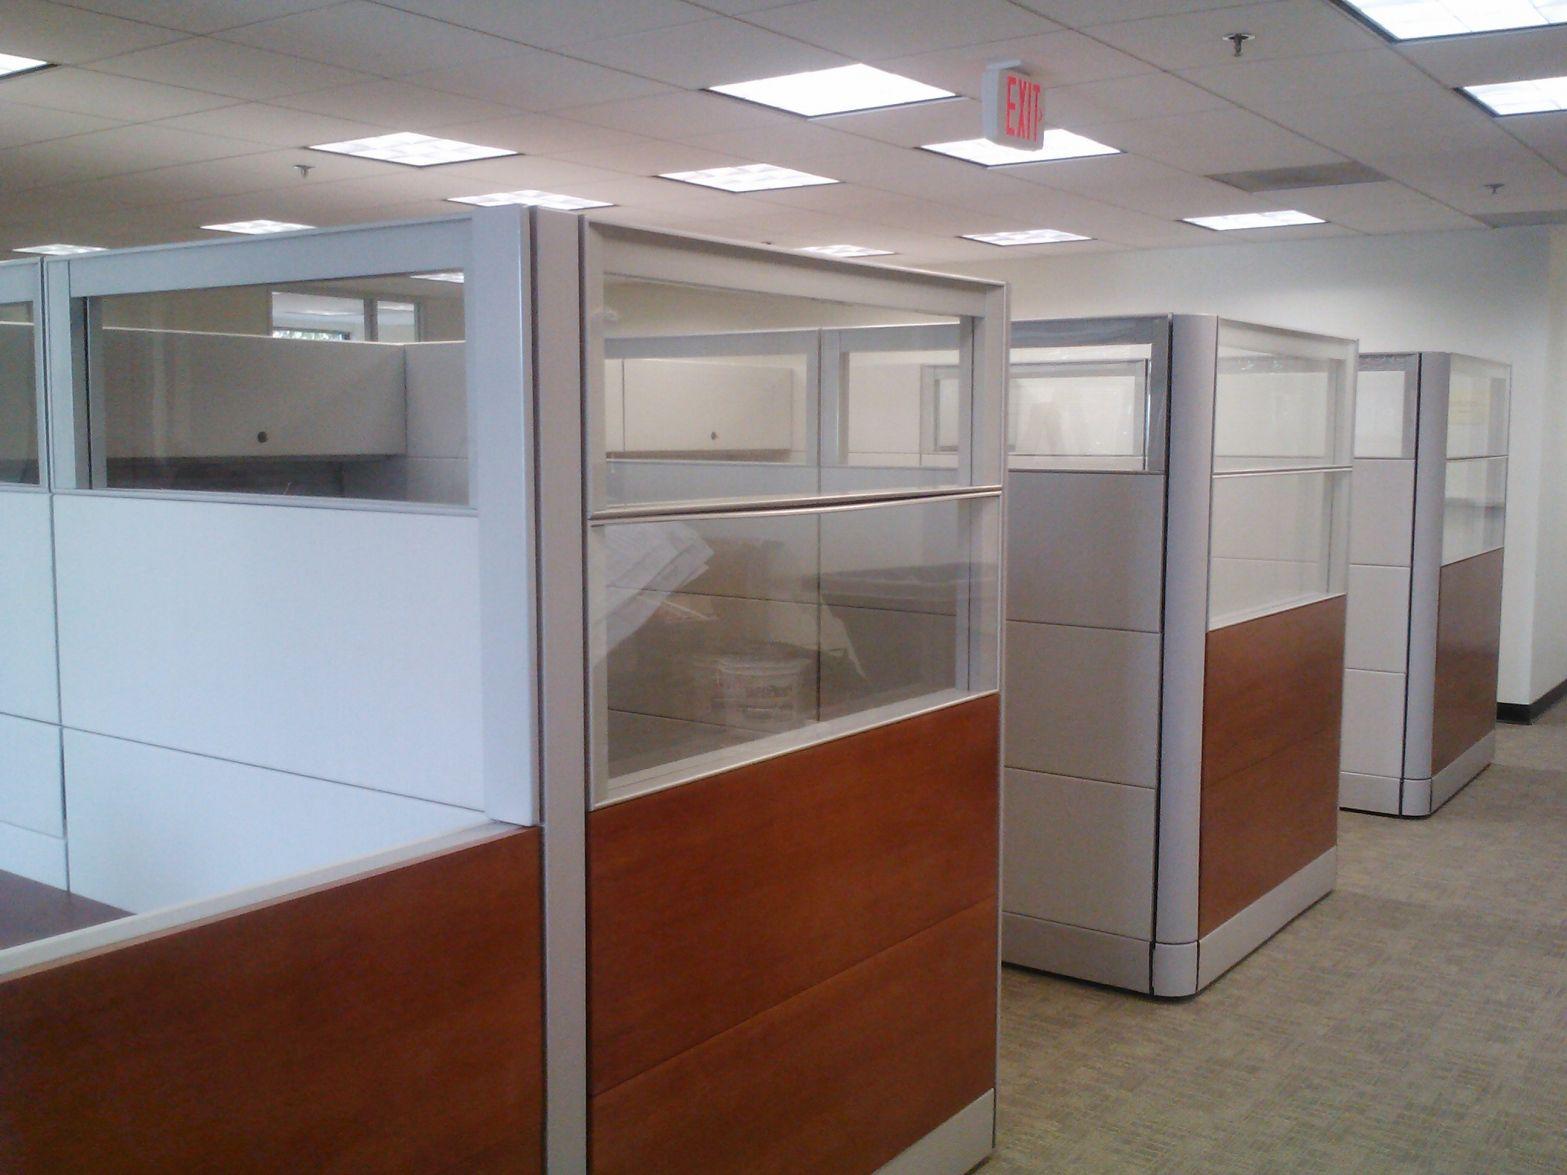 55 Refurbished Office Furniture Tampa Fl